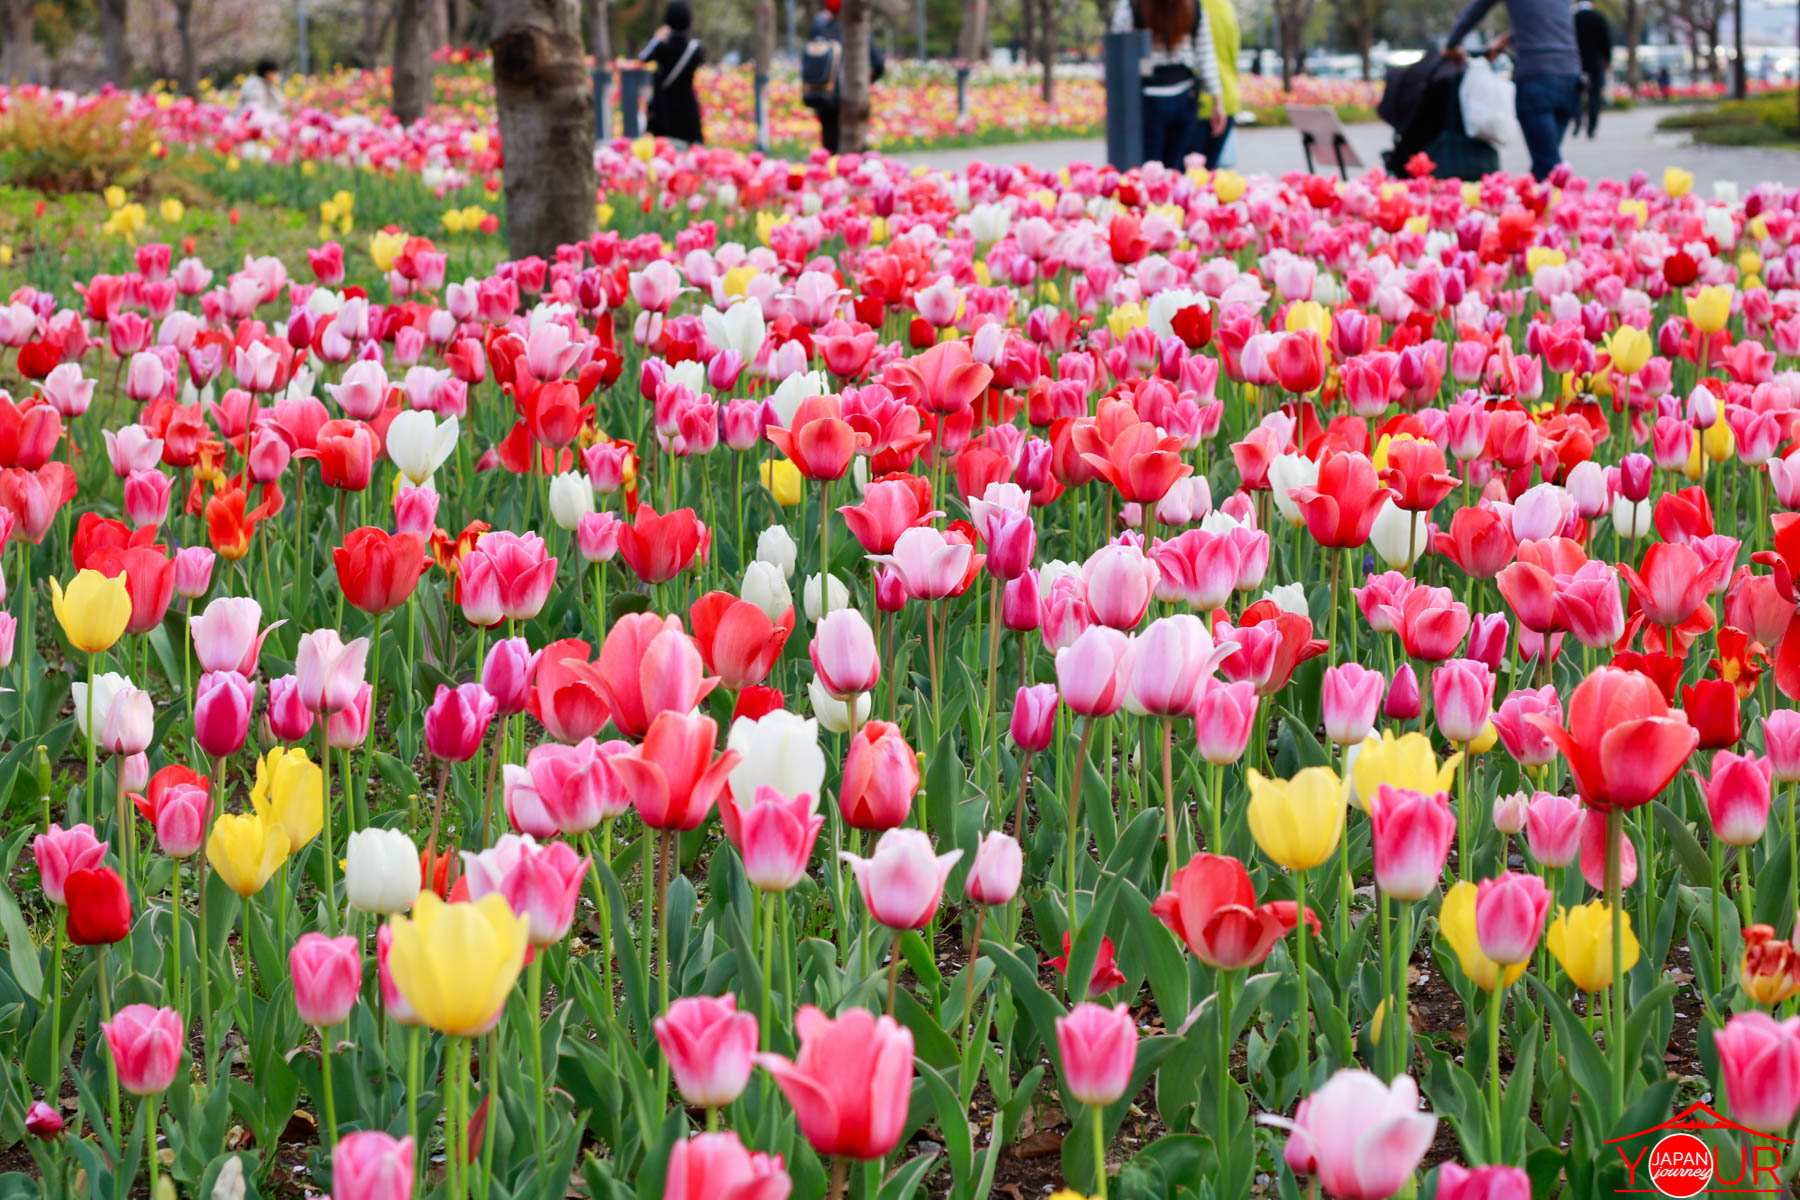 Japan Cherry Blossom Forecast 2021 - Gundam Unicorn Odaiba